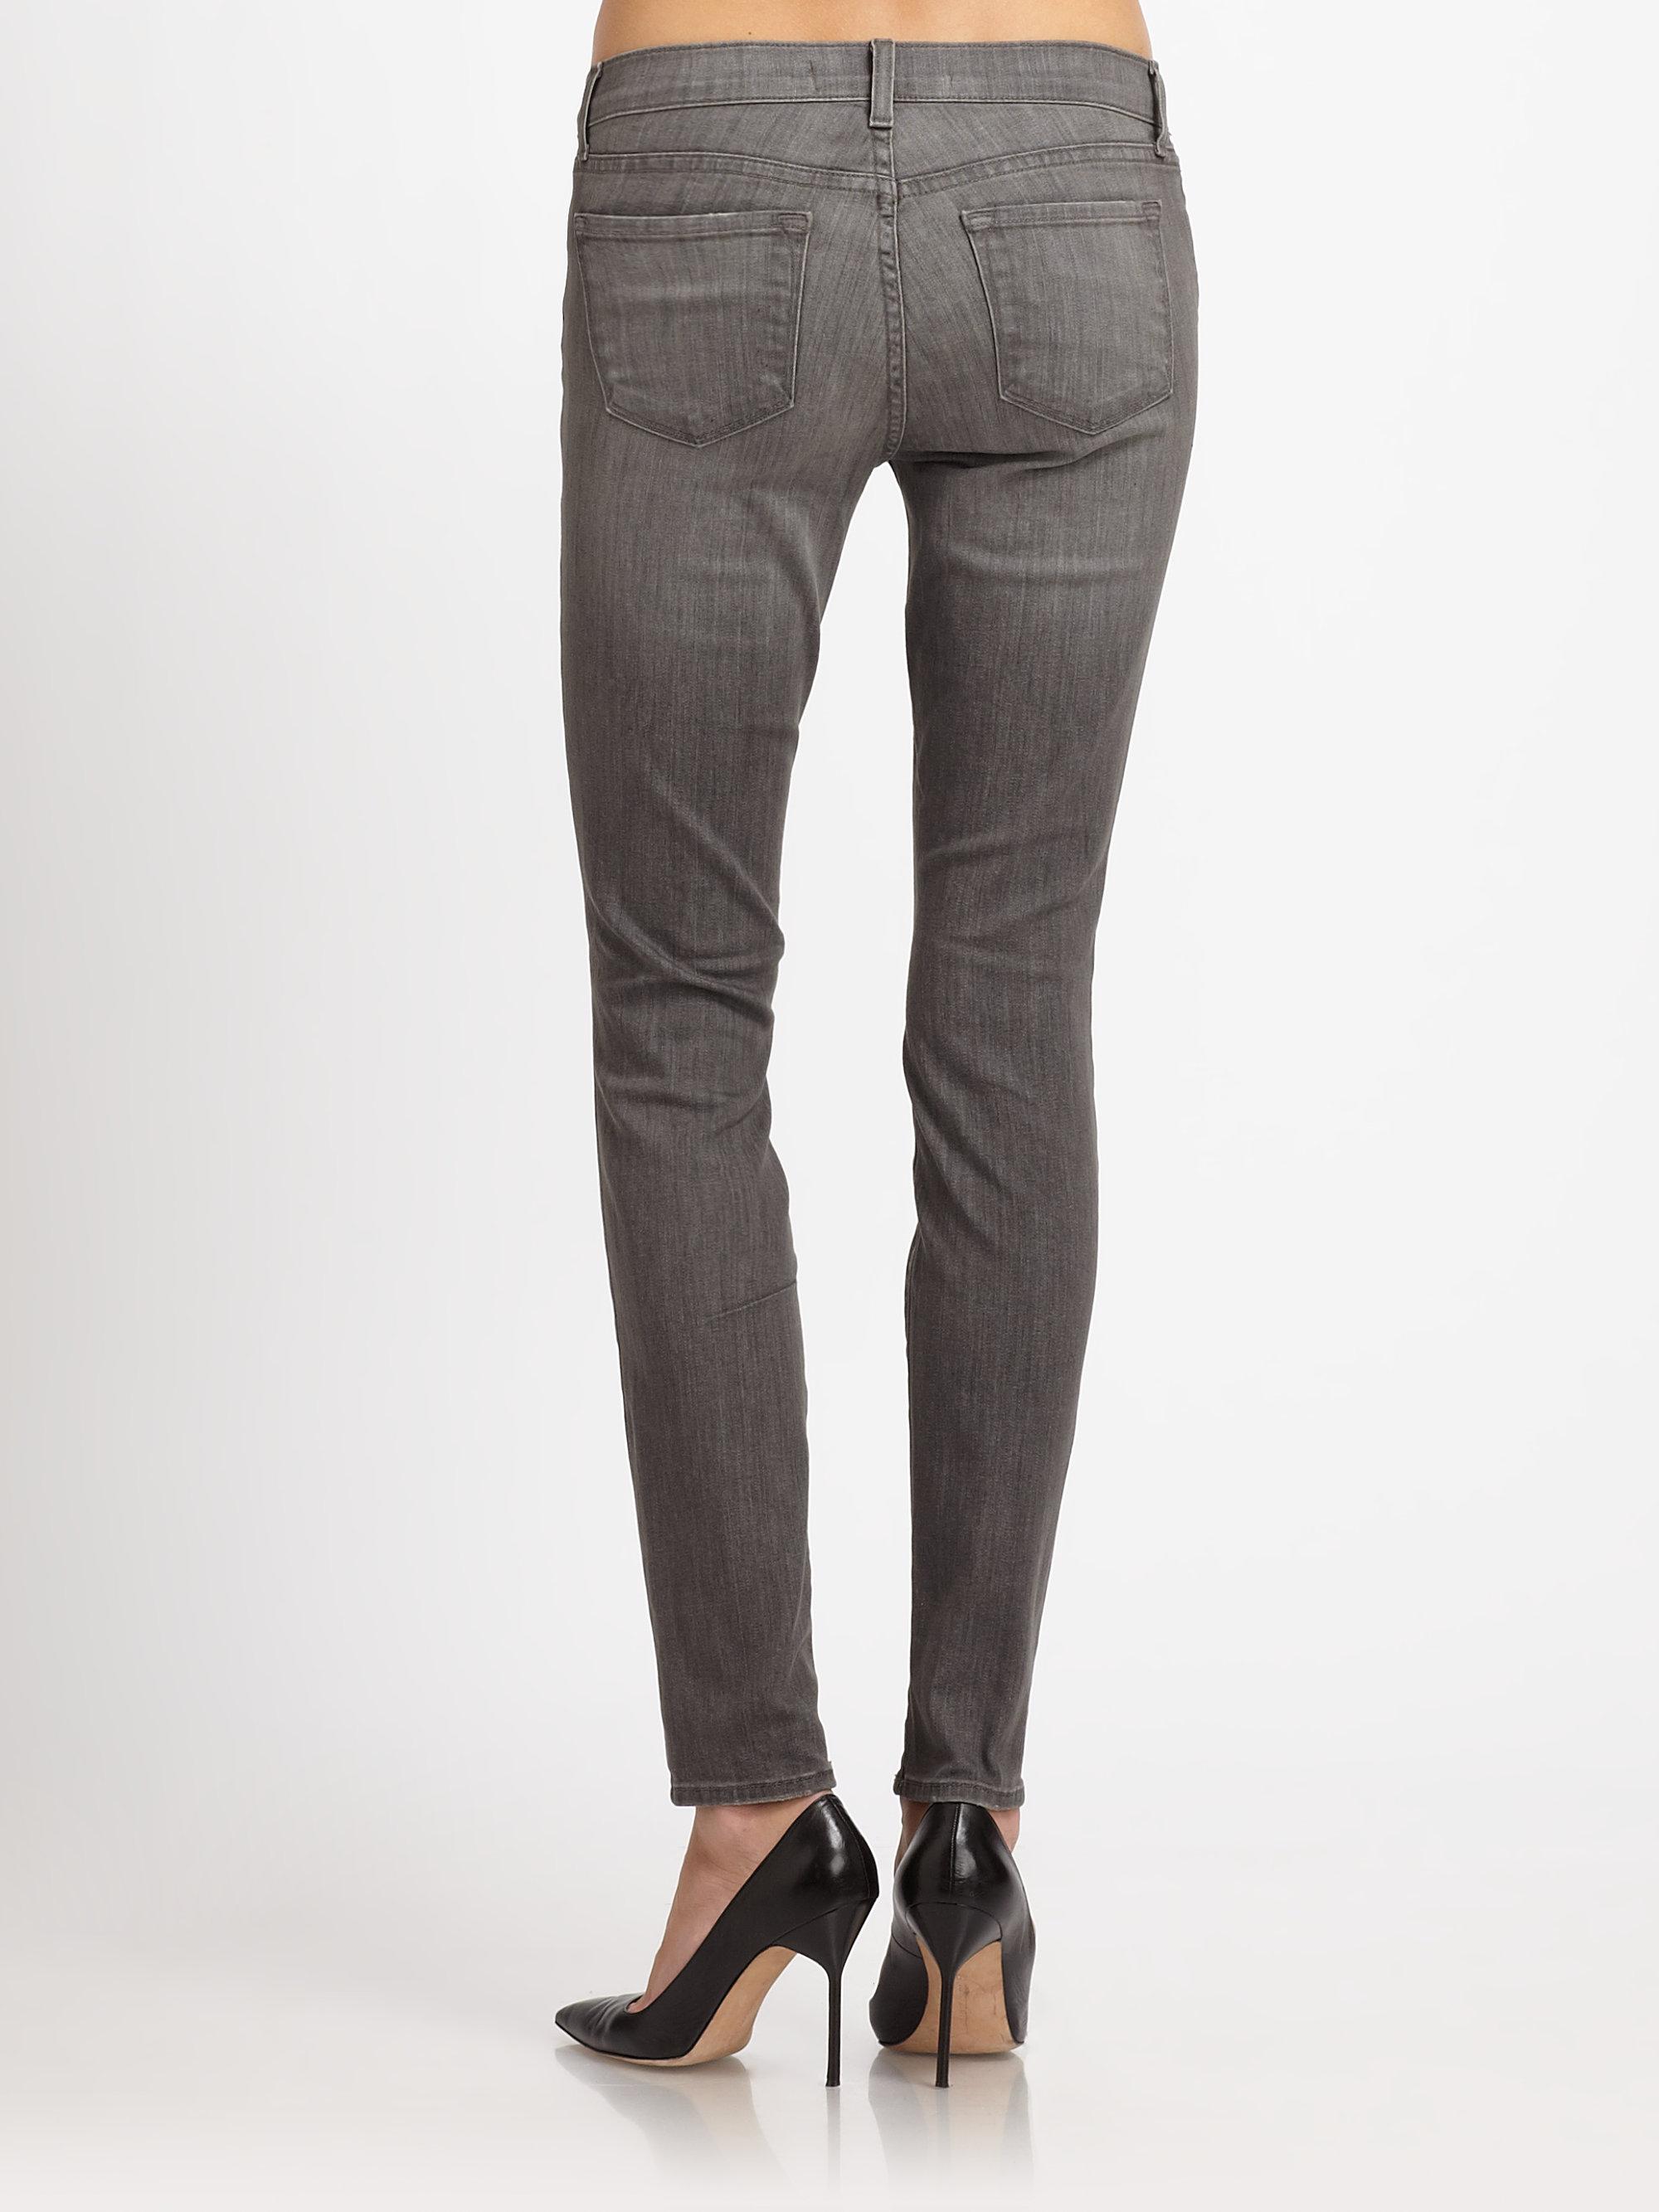 J brand Kingdom Distressed Skinny Jeans in Gray | Lyst